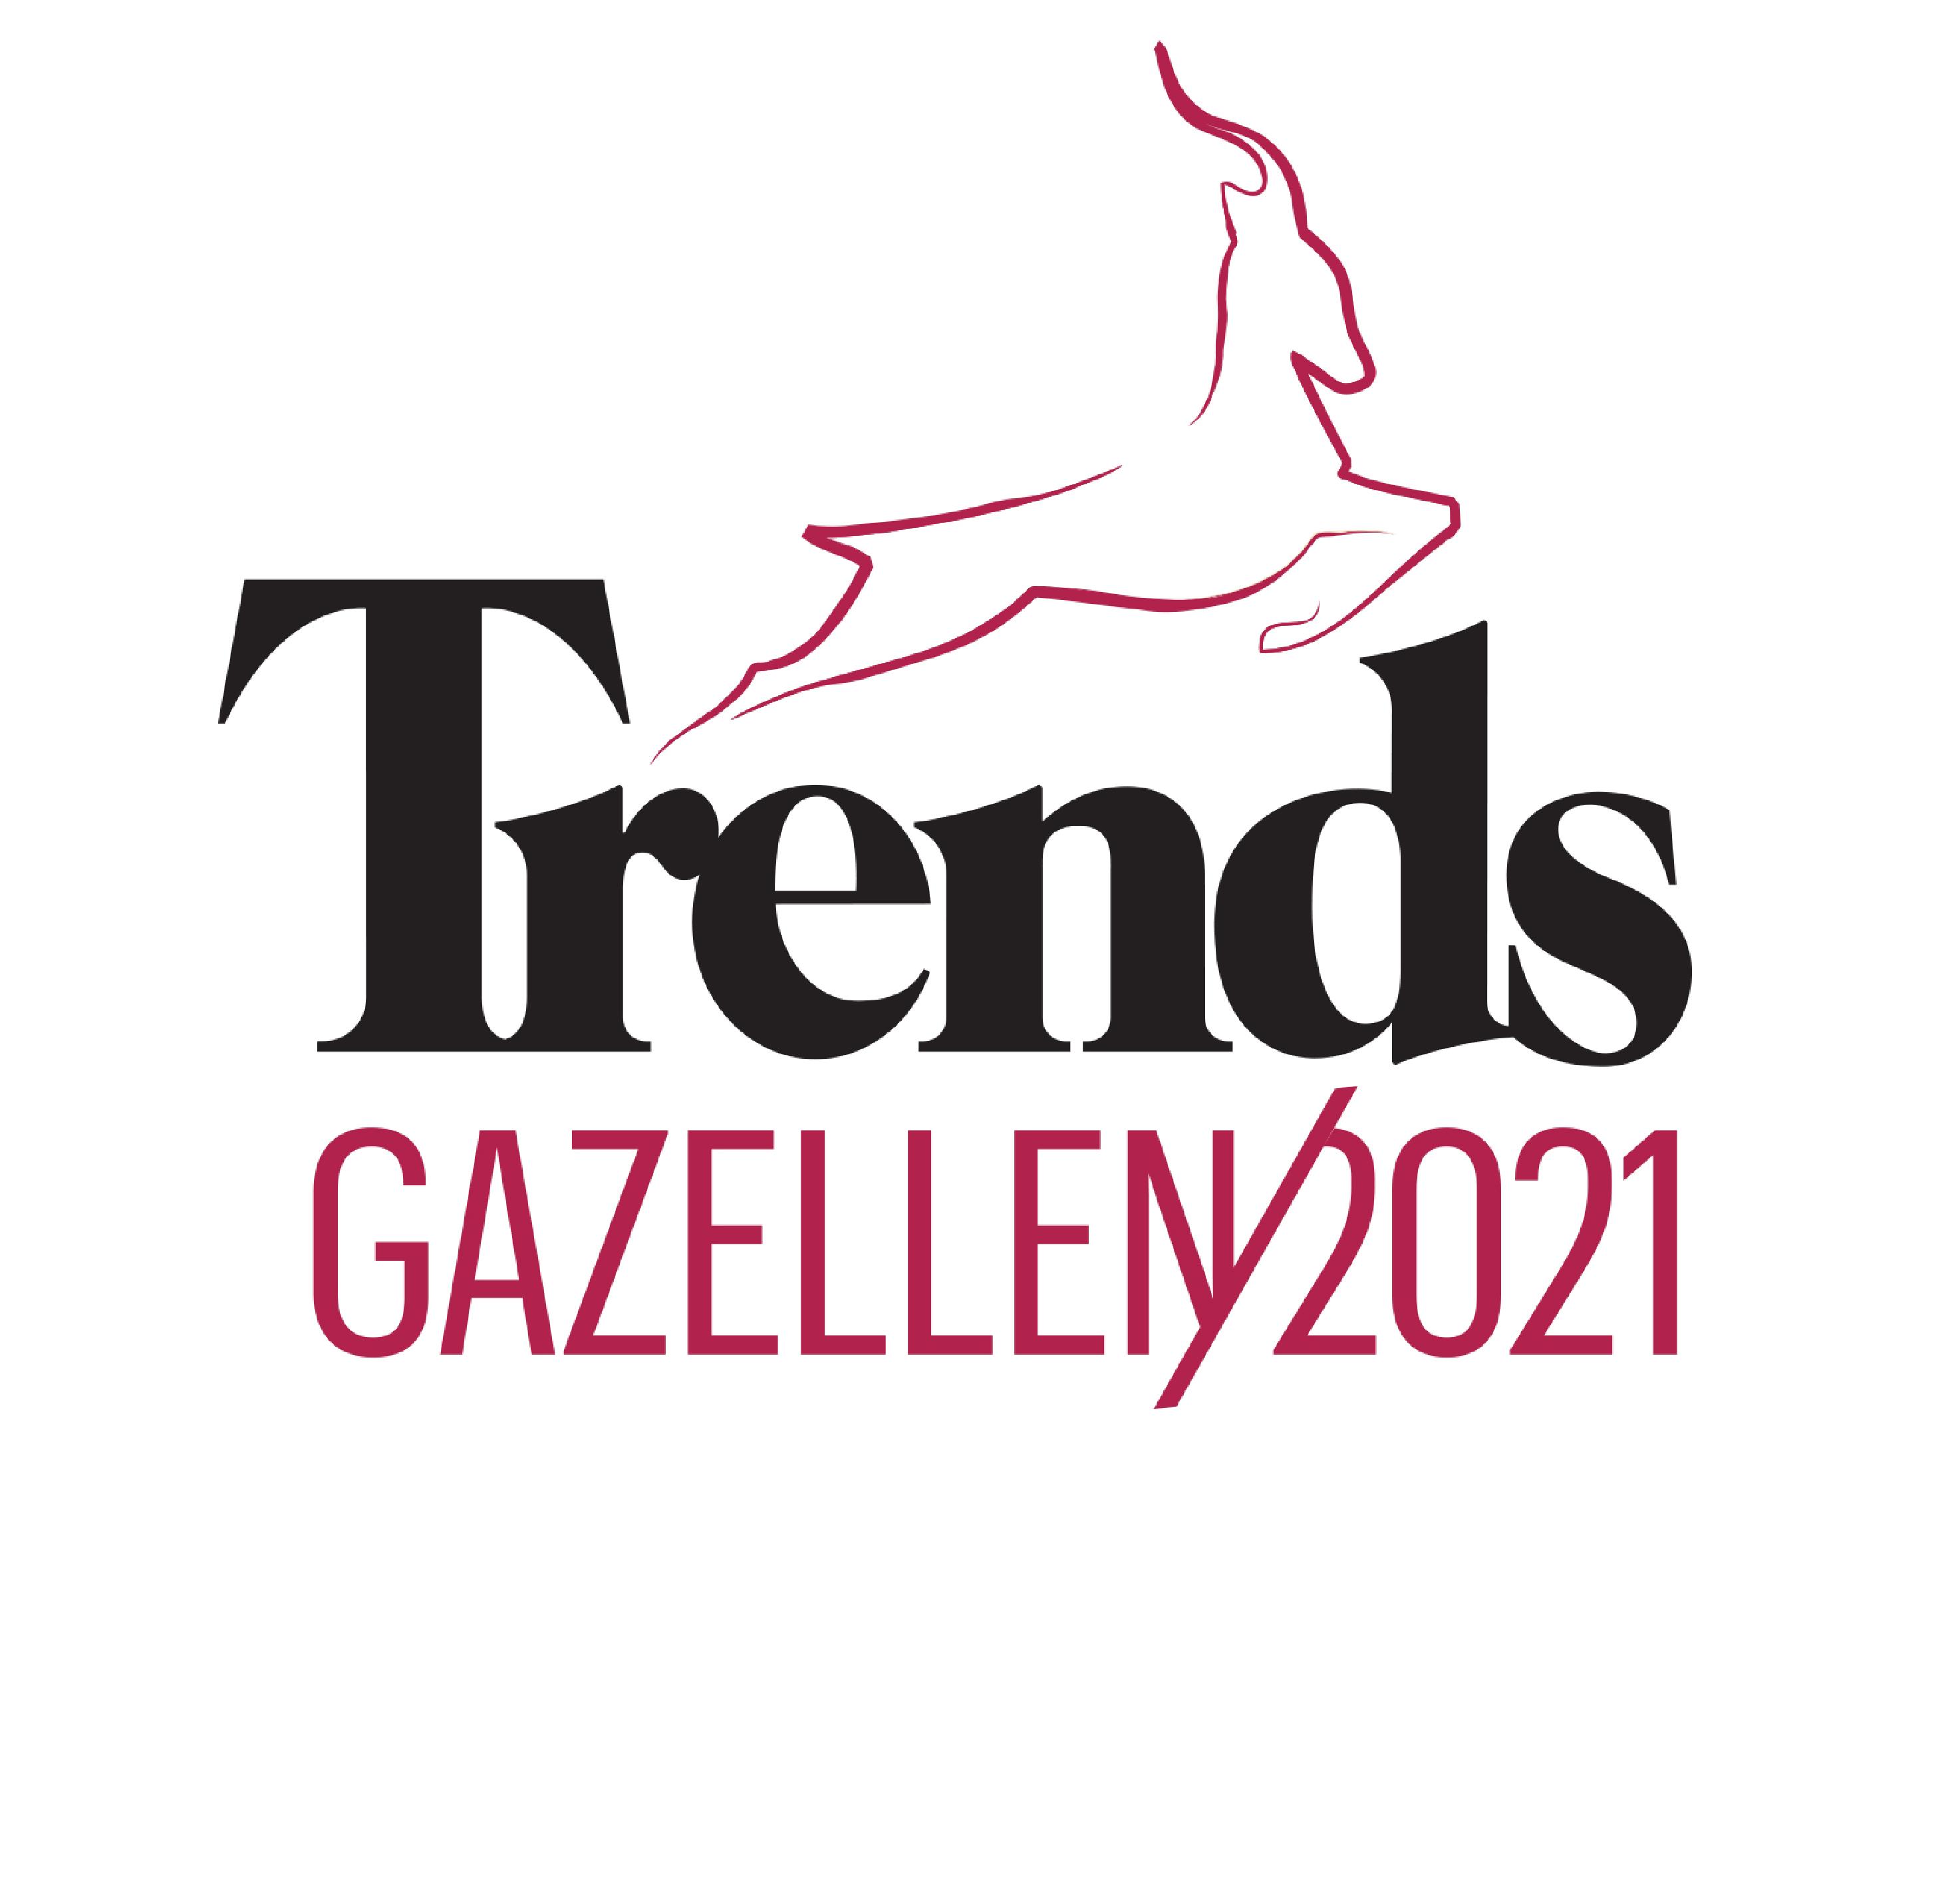 TrendGazellen